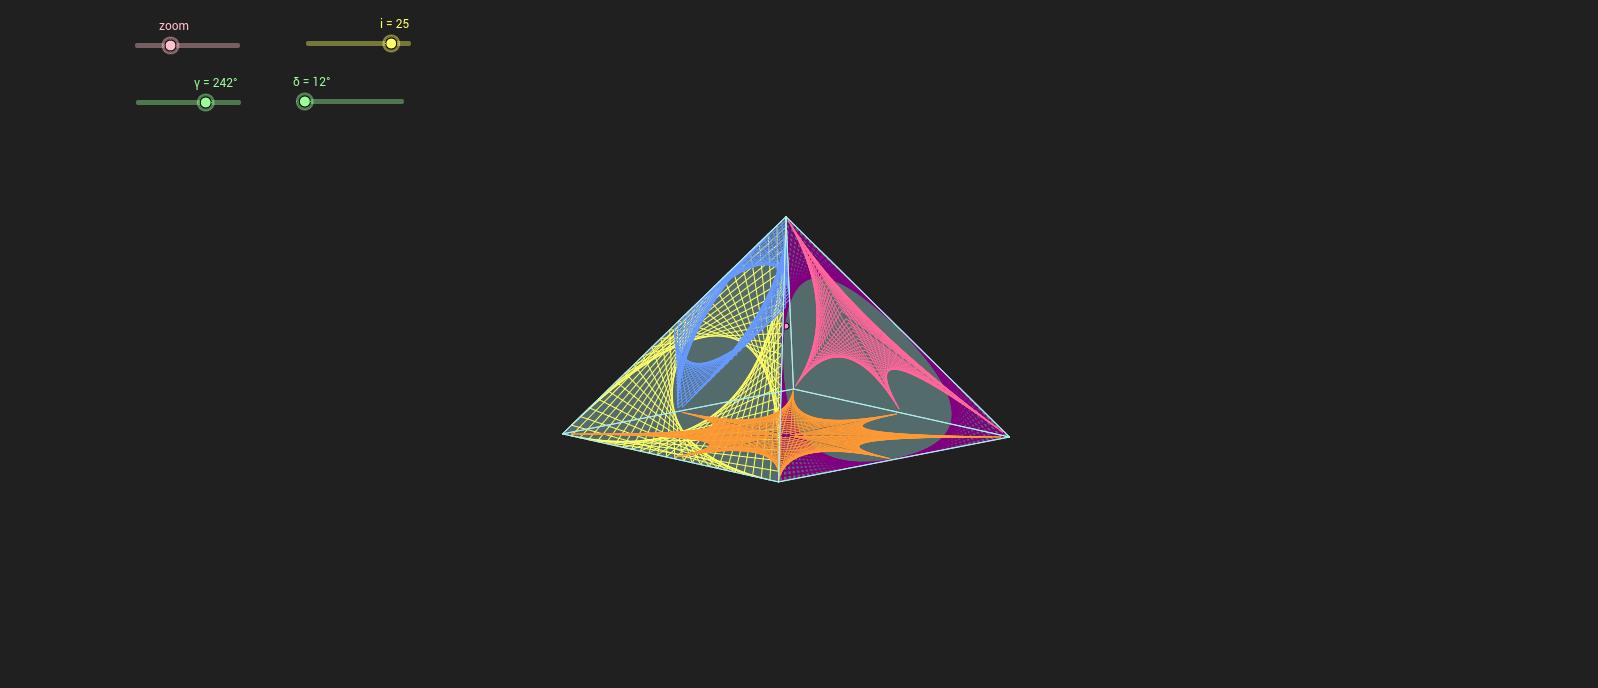 Hiloramas 3D